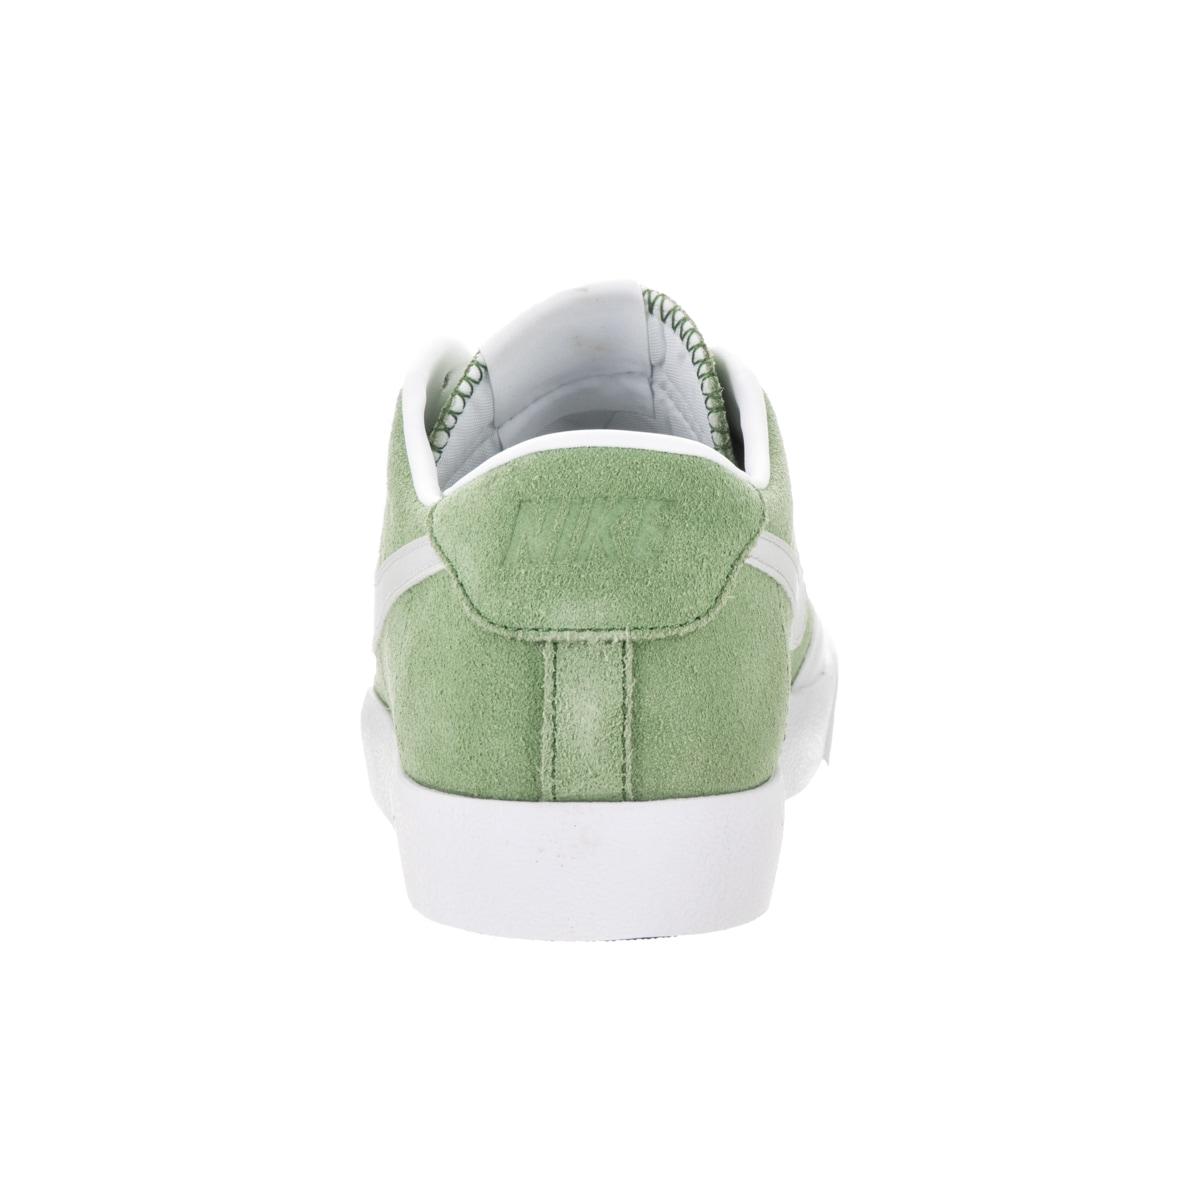 pretty nice 22da8 2d786 Shop Nike Men s Zoom All Court Ck Treeline, Light Bone, White Suede Skate  Shoe - Free Shipping Today - Overstock.com - 13312083